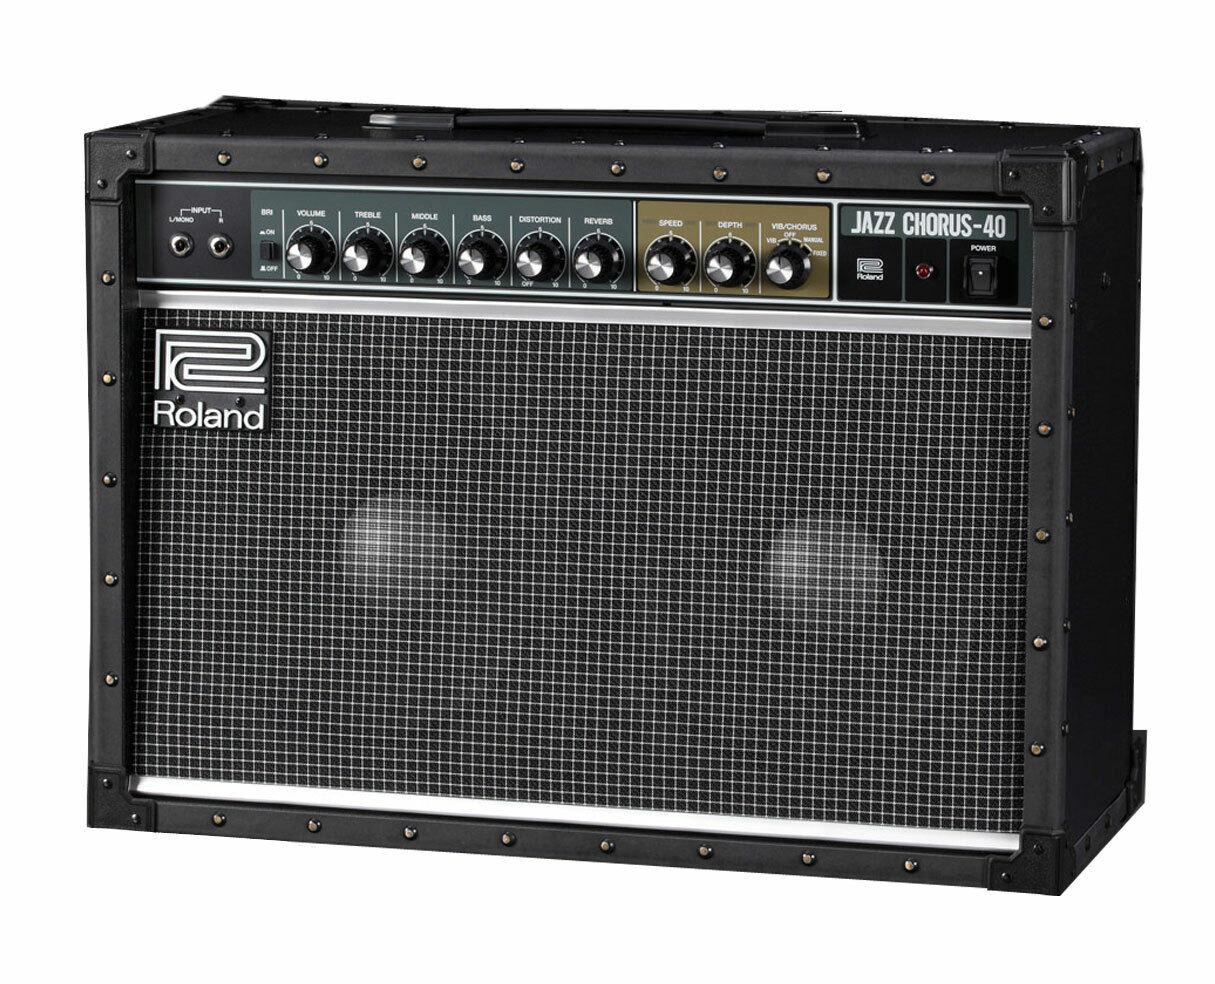 Roland JC-40 Jazz Chorus Guitar Amplifier 40 Watt Speaker PROAUDIOSTAR. Buy it now for 599.99